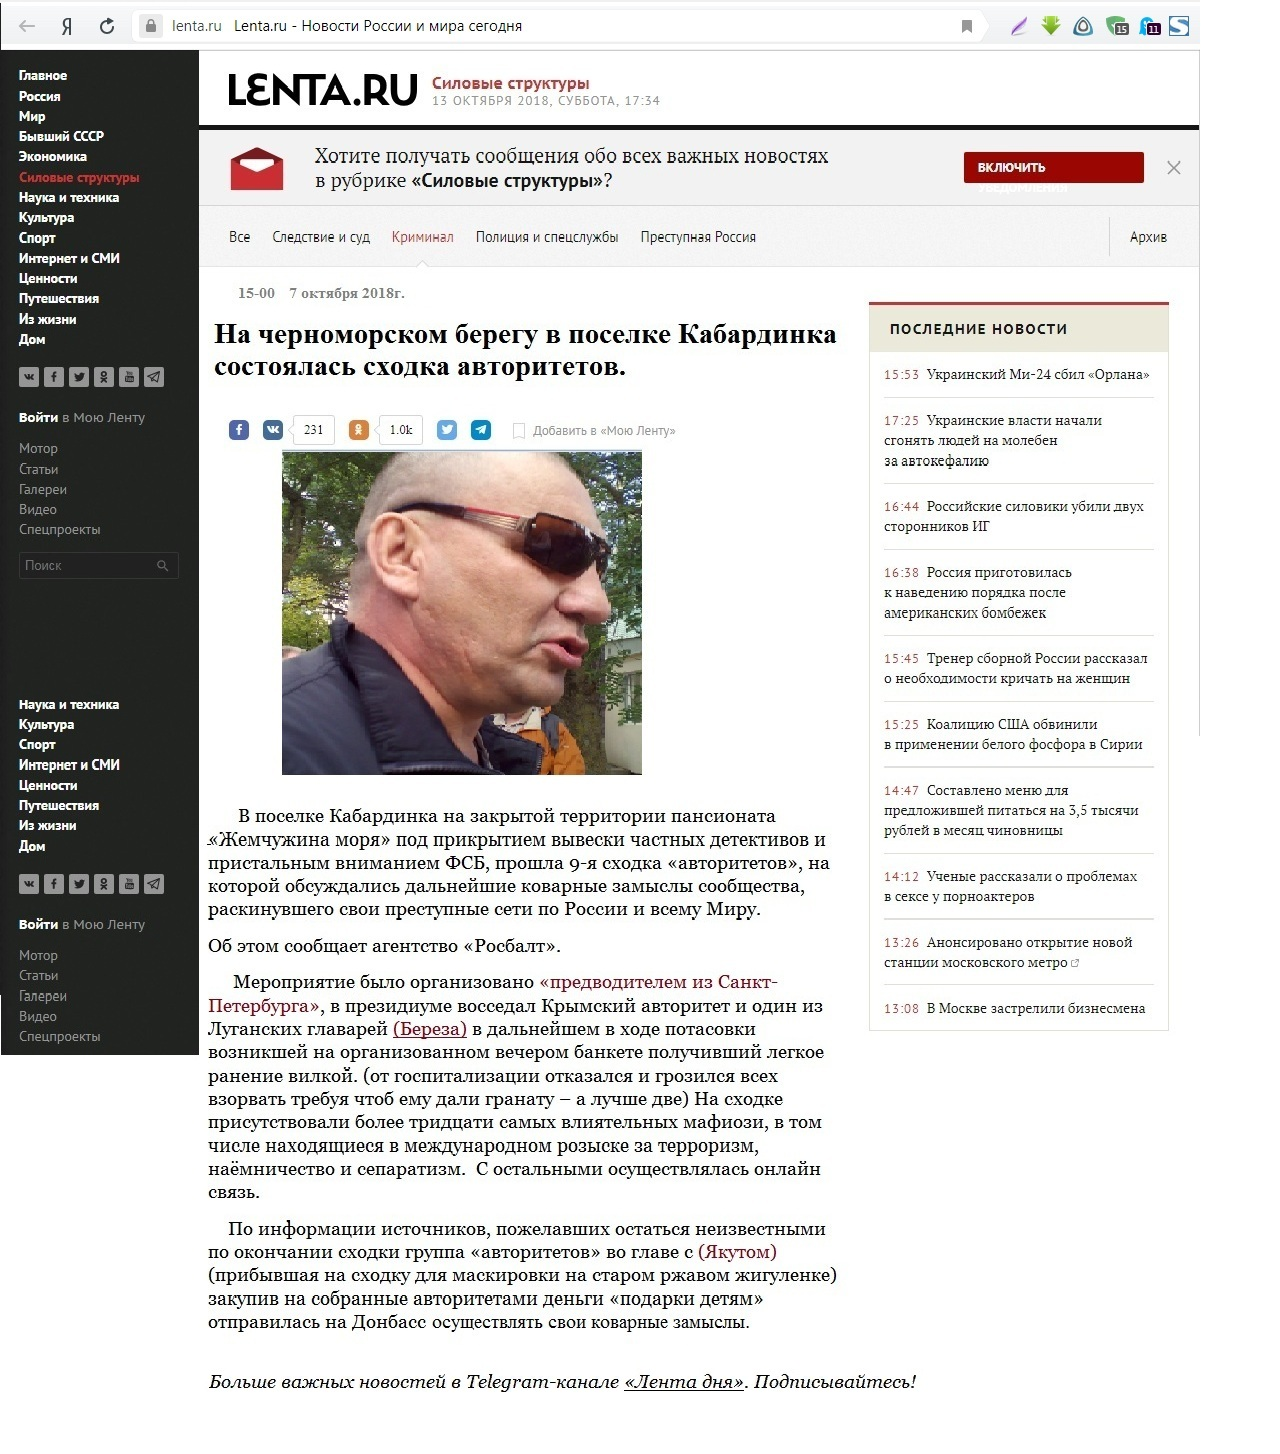 9 Конференция Международного объединения детективов Кабардинка. Caa_aa11